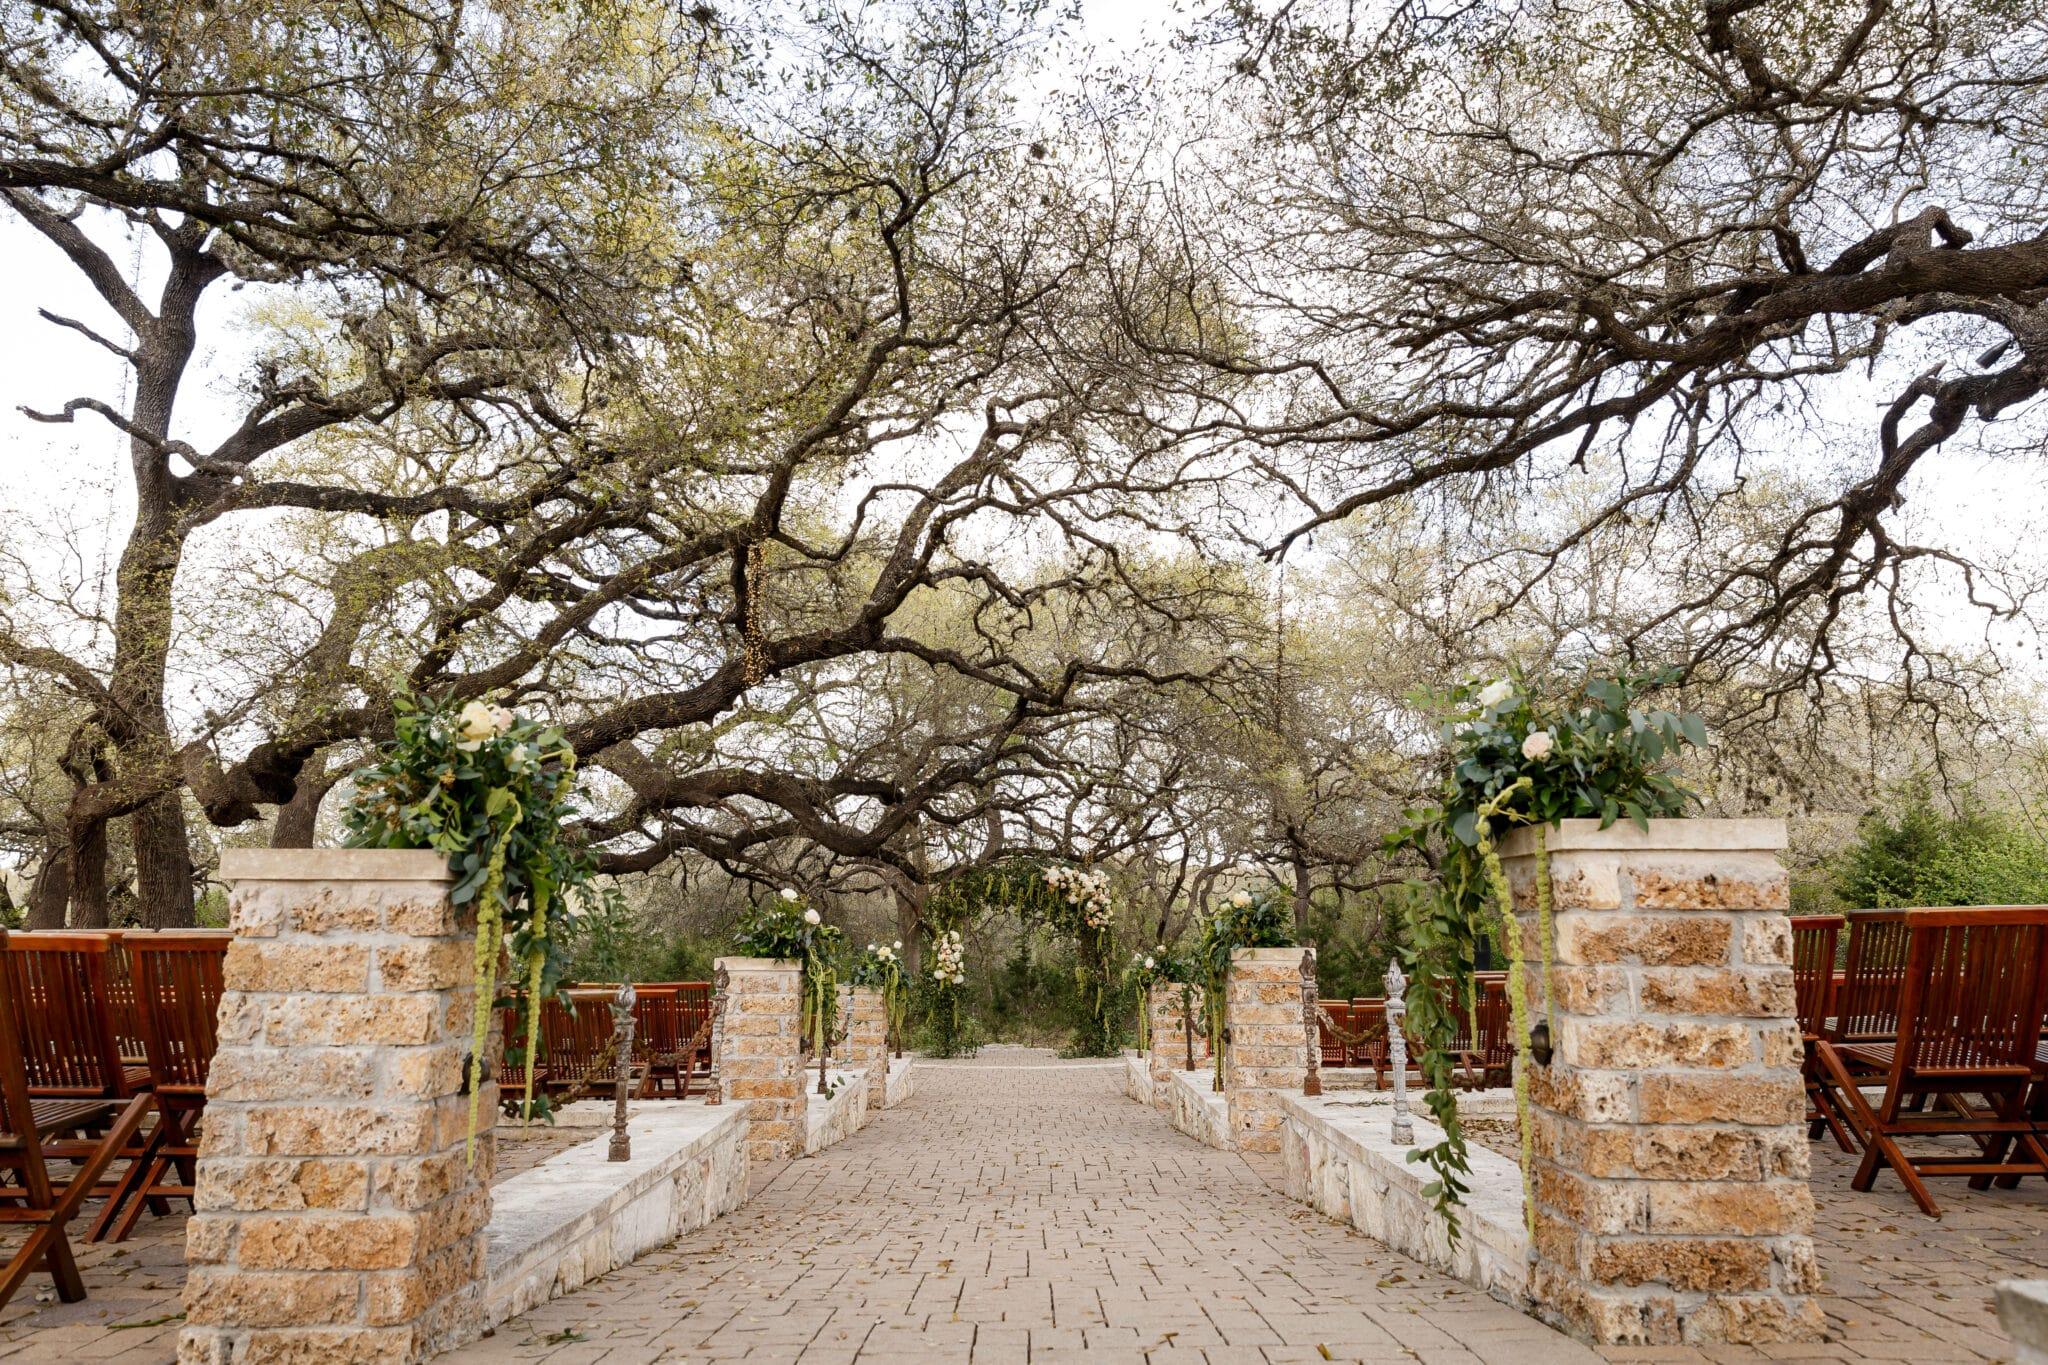 destination wedding ceremony venue with oak tree canopy and stone aisle